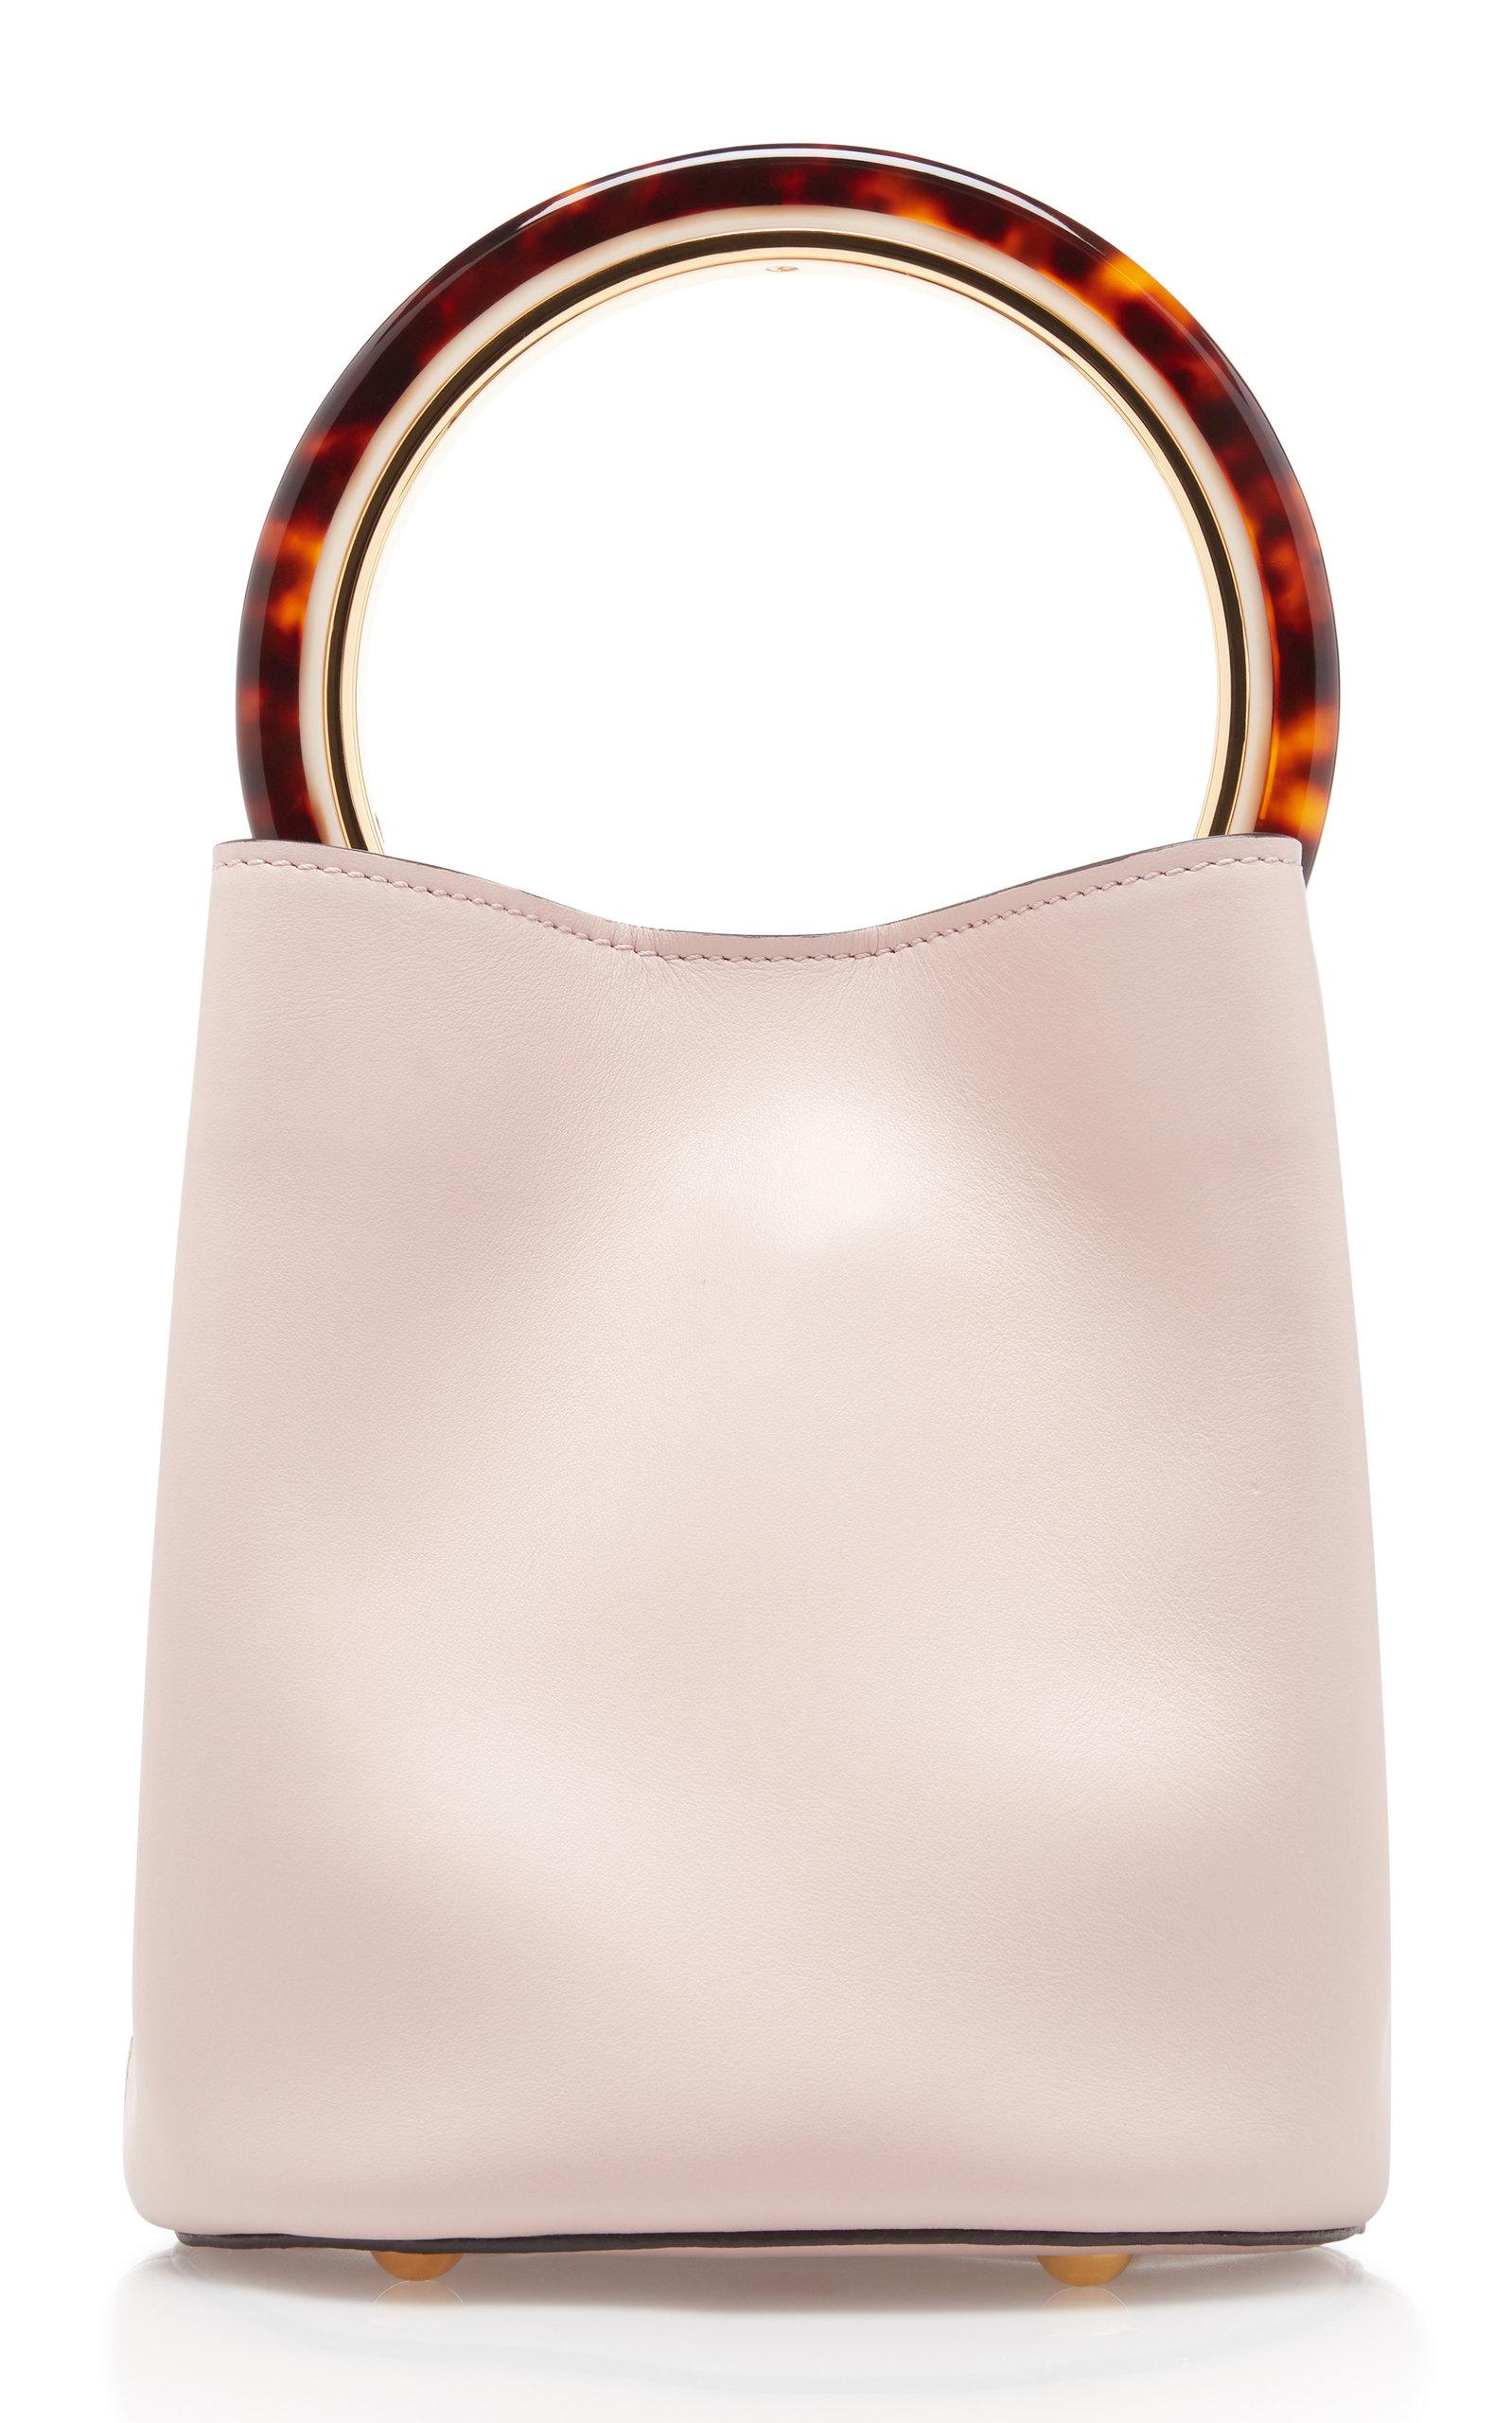 290d3b755 Pannier Leather Bucket Bag by Marni | Moda Operandi